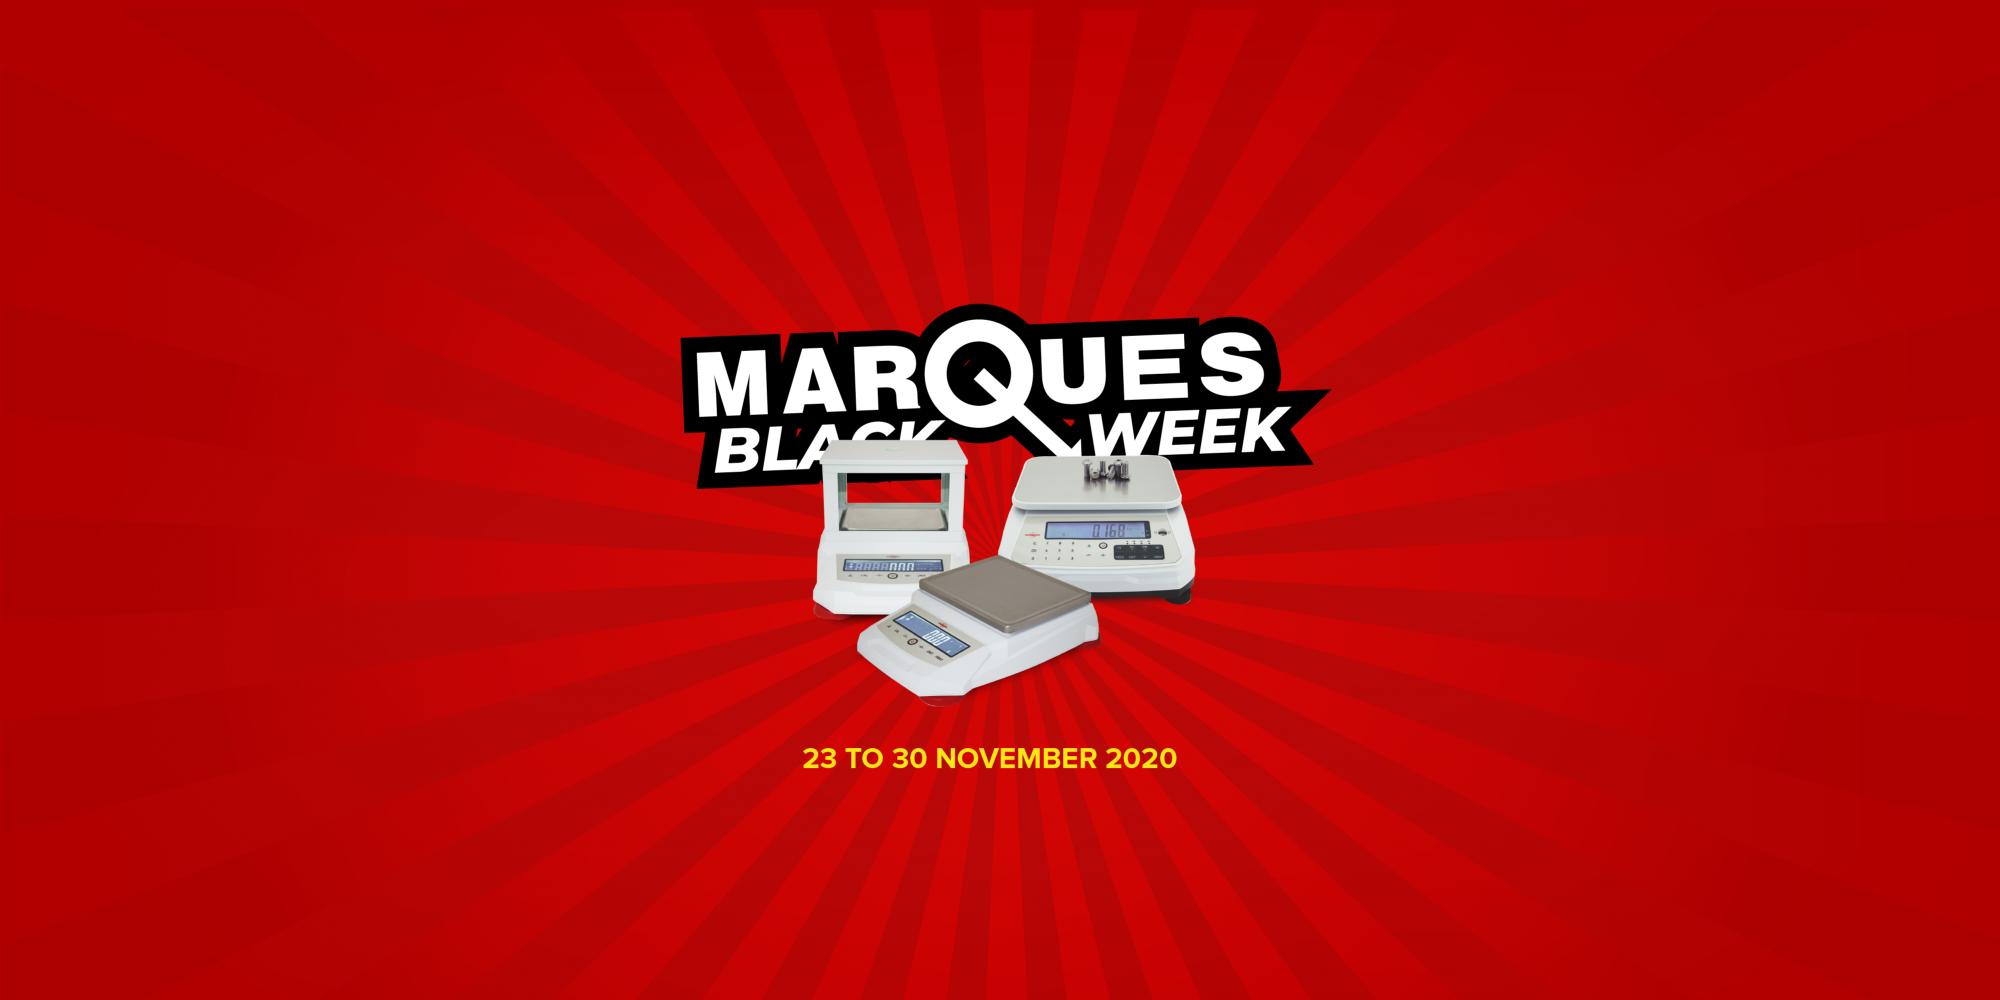 TUDO O QUE PRECISA DE SABER SOBRE A MARQUES BLACK WEEK 2020